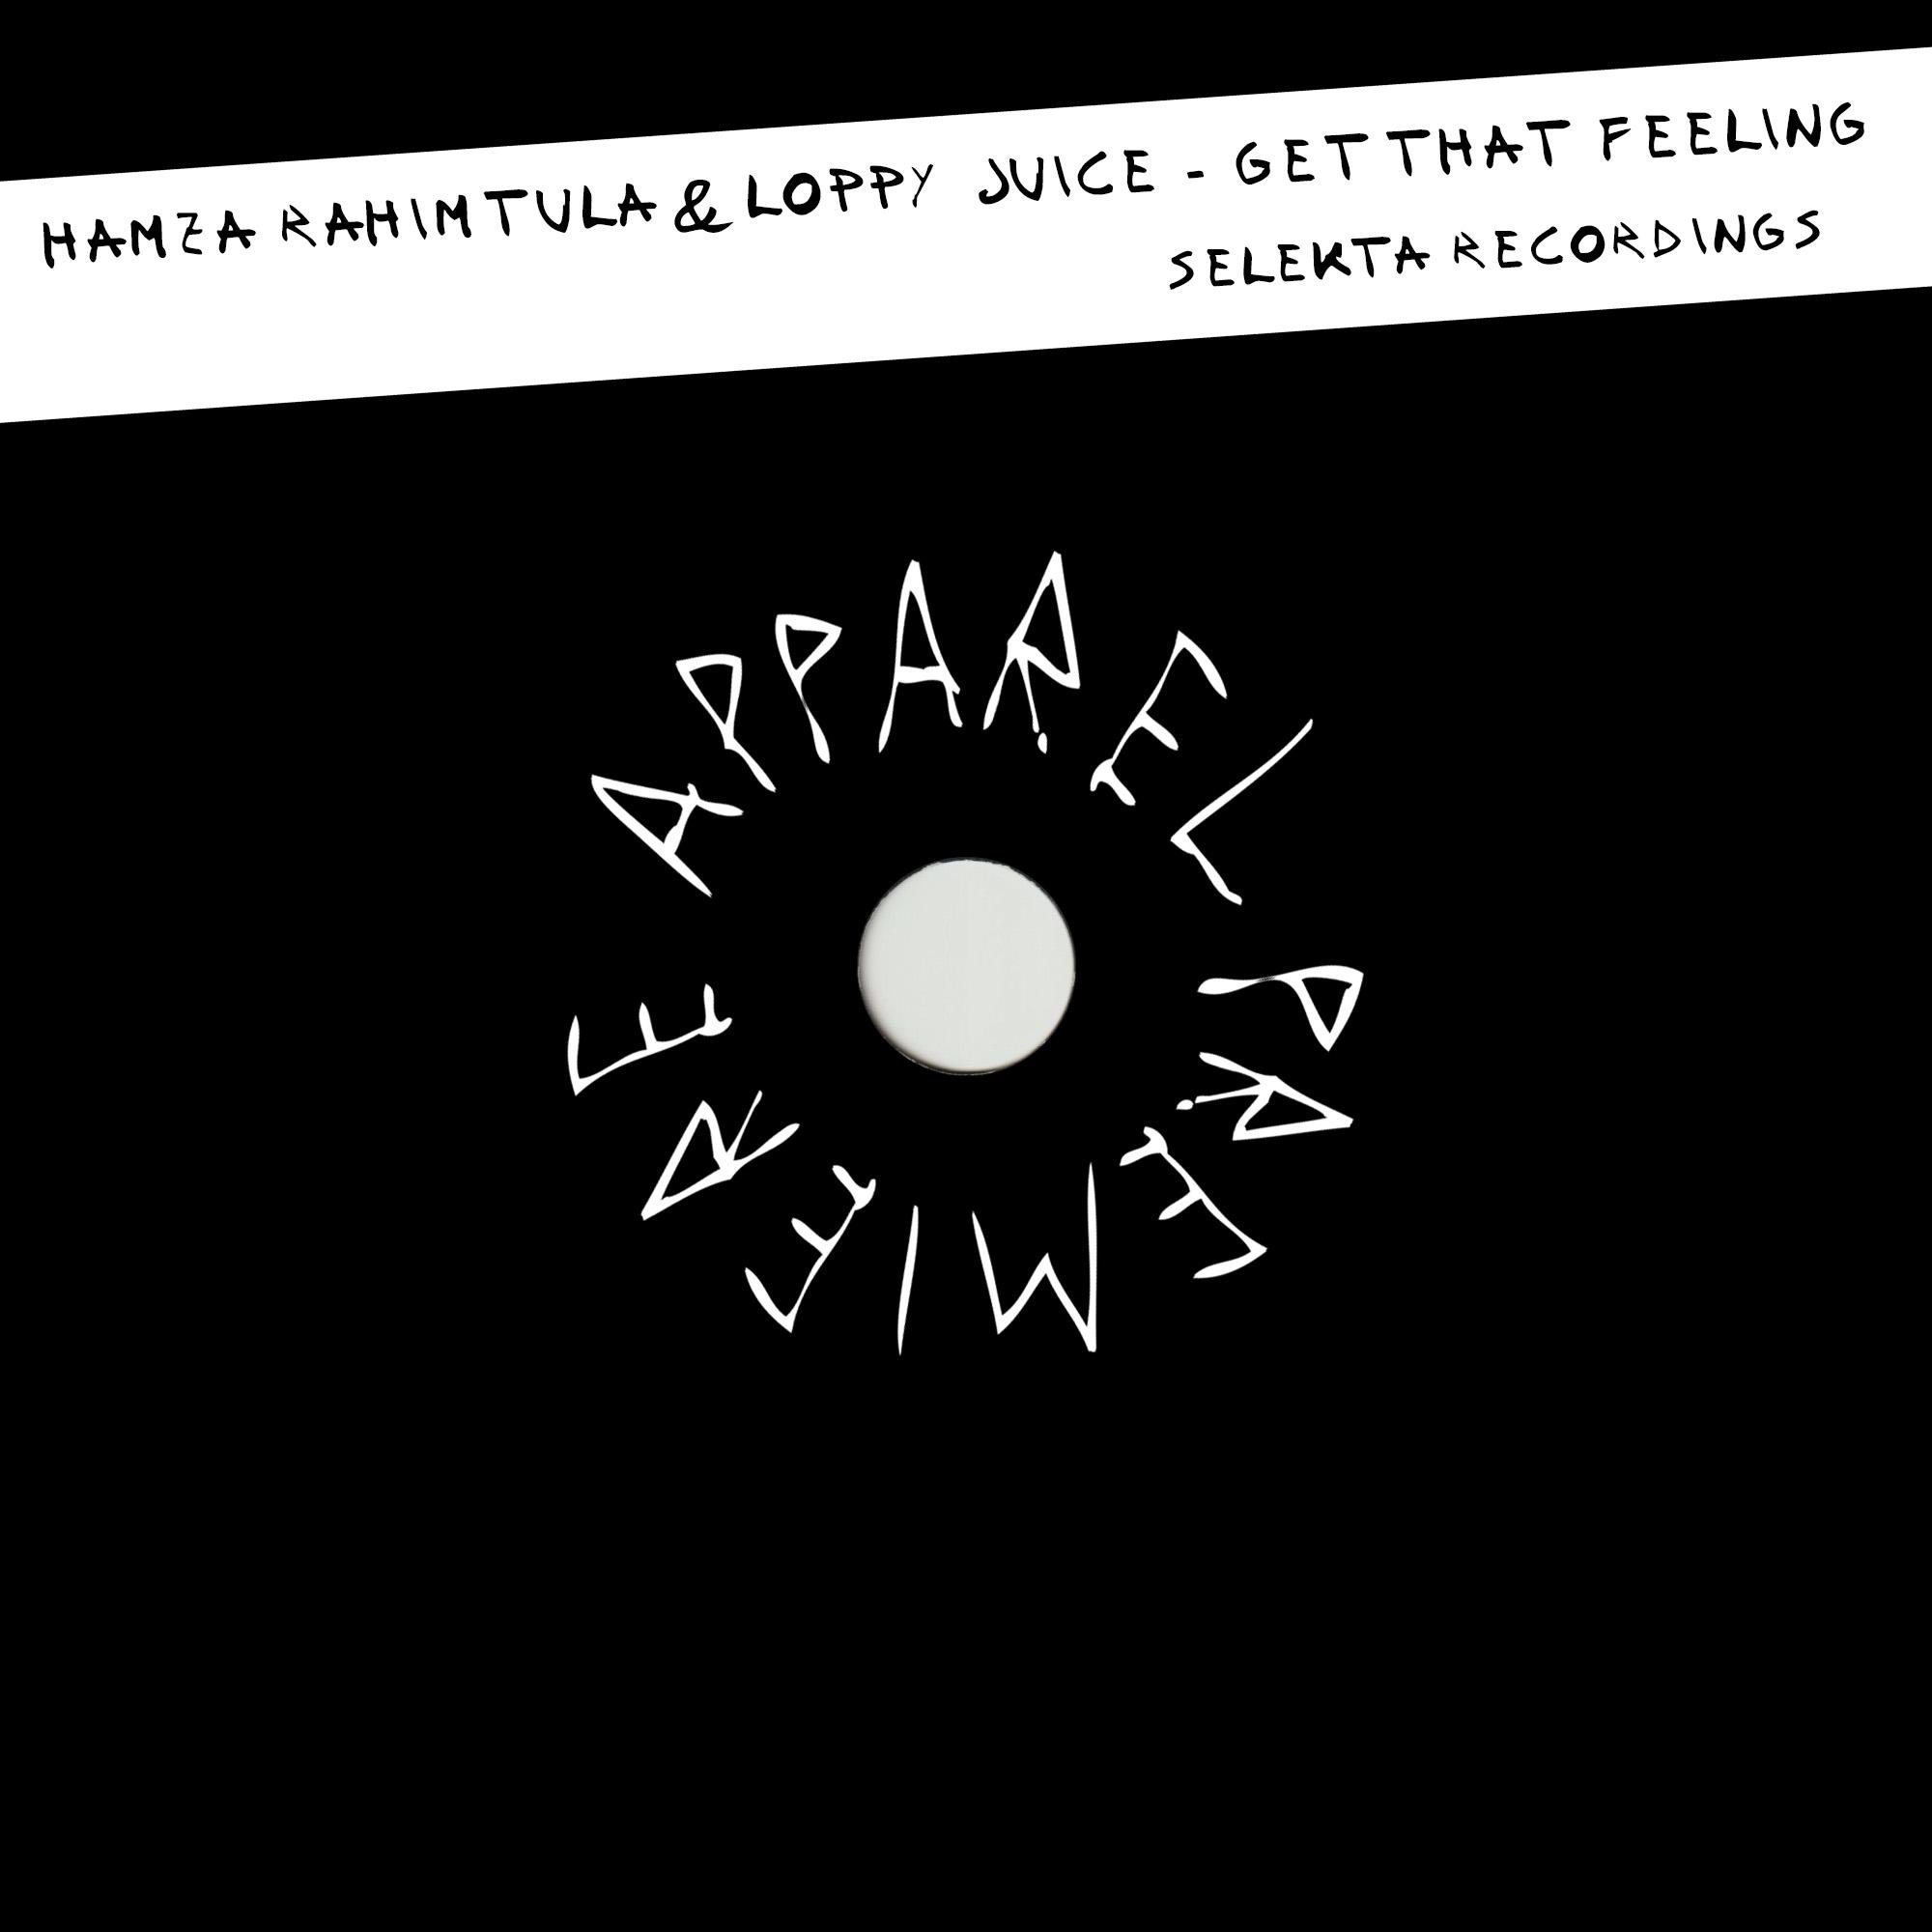 APPAREL PREMIERE: Hamza Rahimtula & Loopy Juice – Get That Feeling [Selekta Recordings]